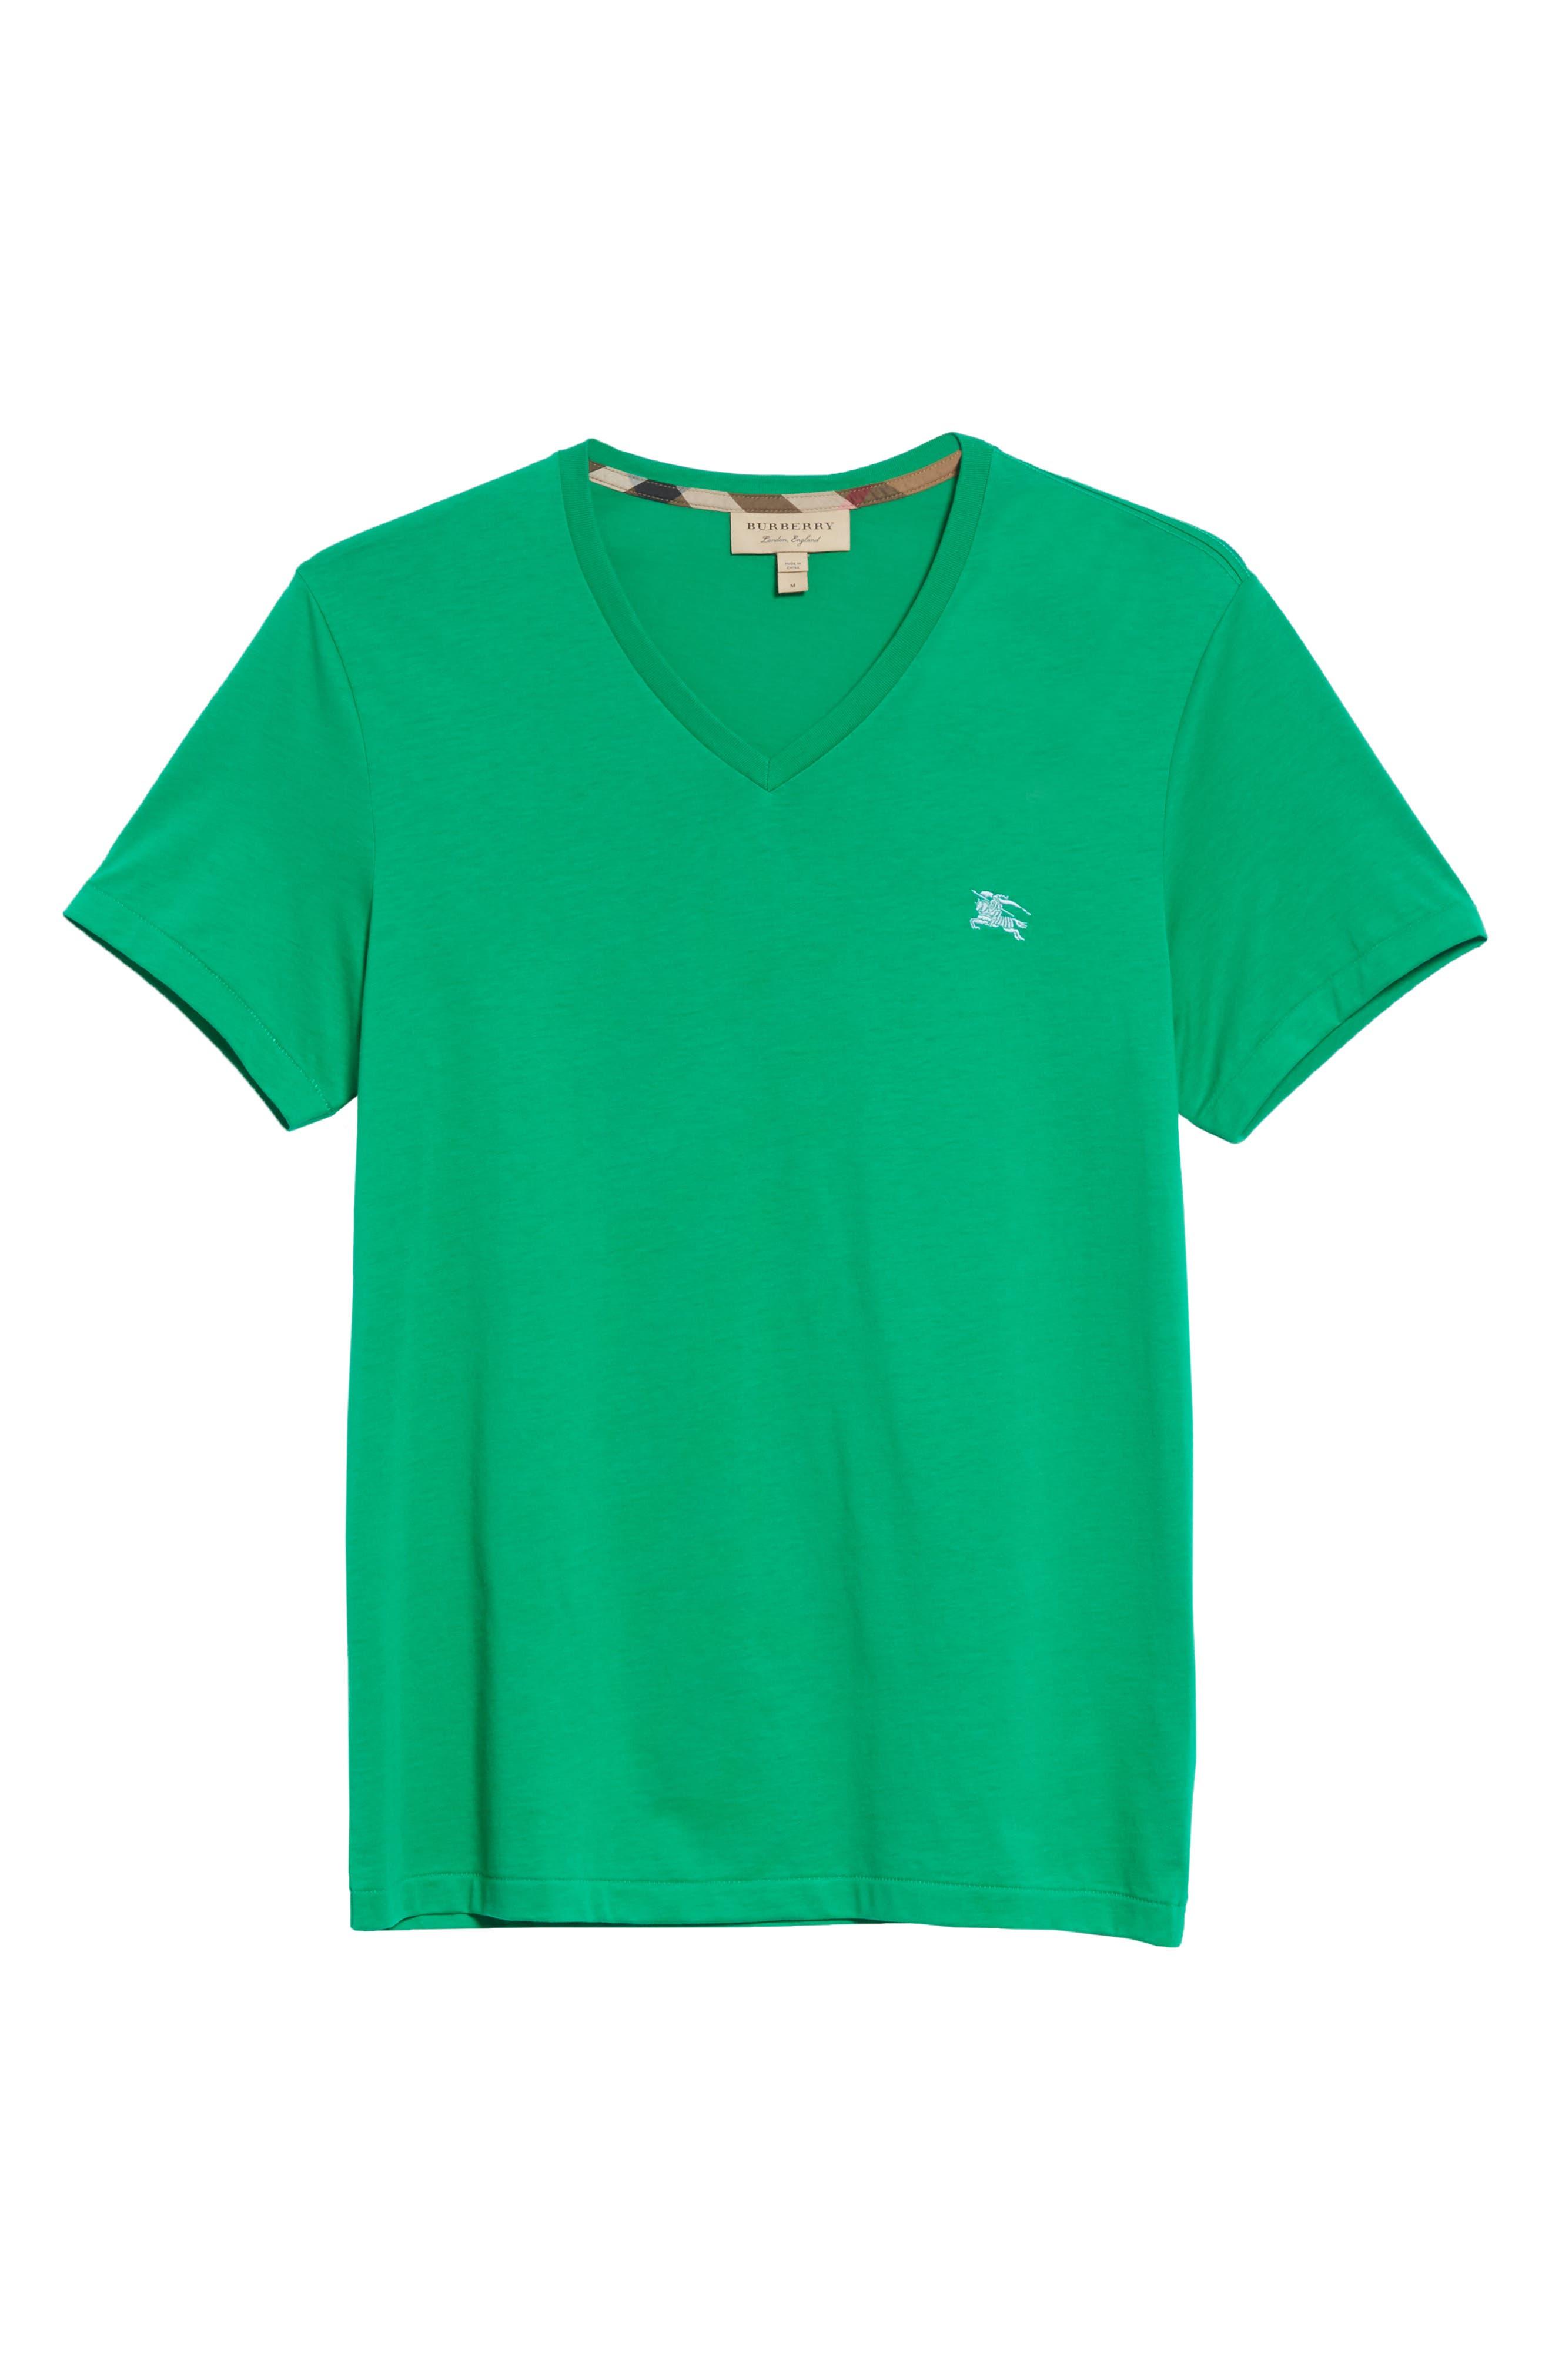 Jadford V-Neck T-Shirt,                             Alternate thumbnail 6, color,                             BRIGHT GREEN